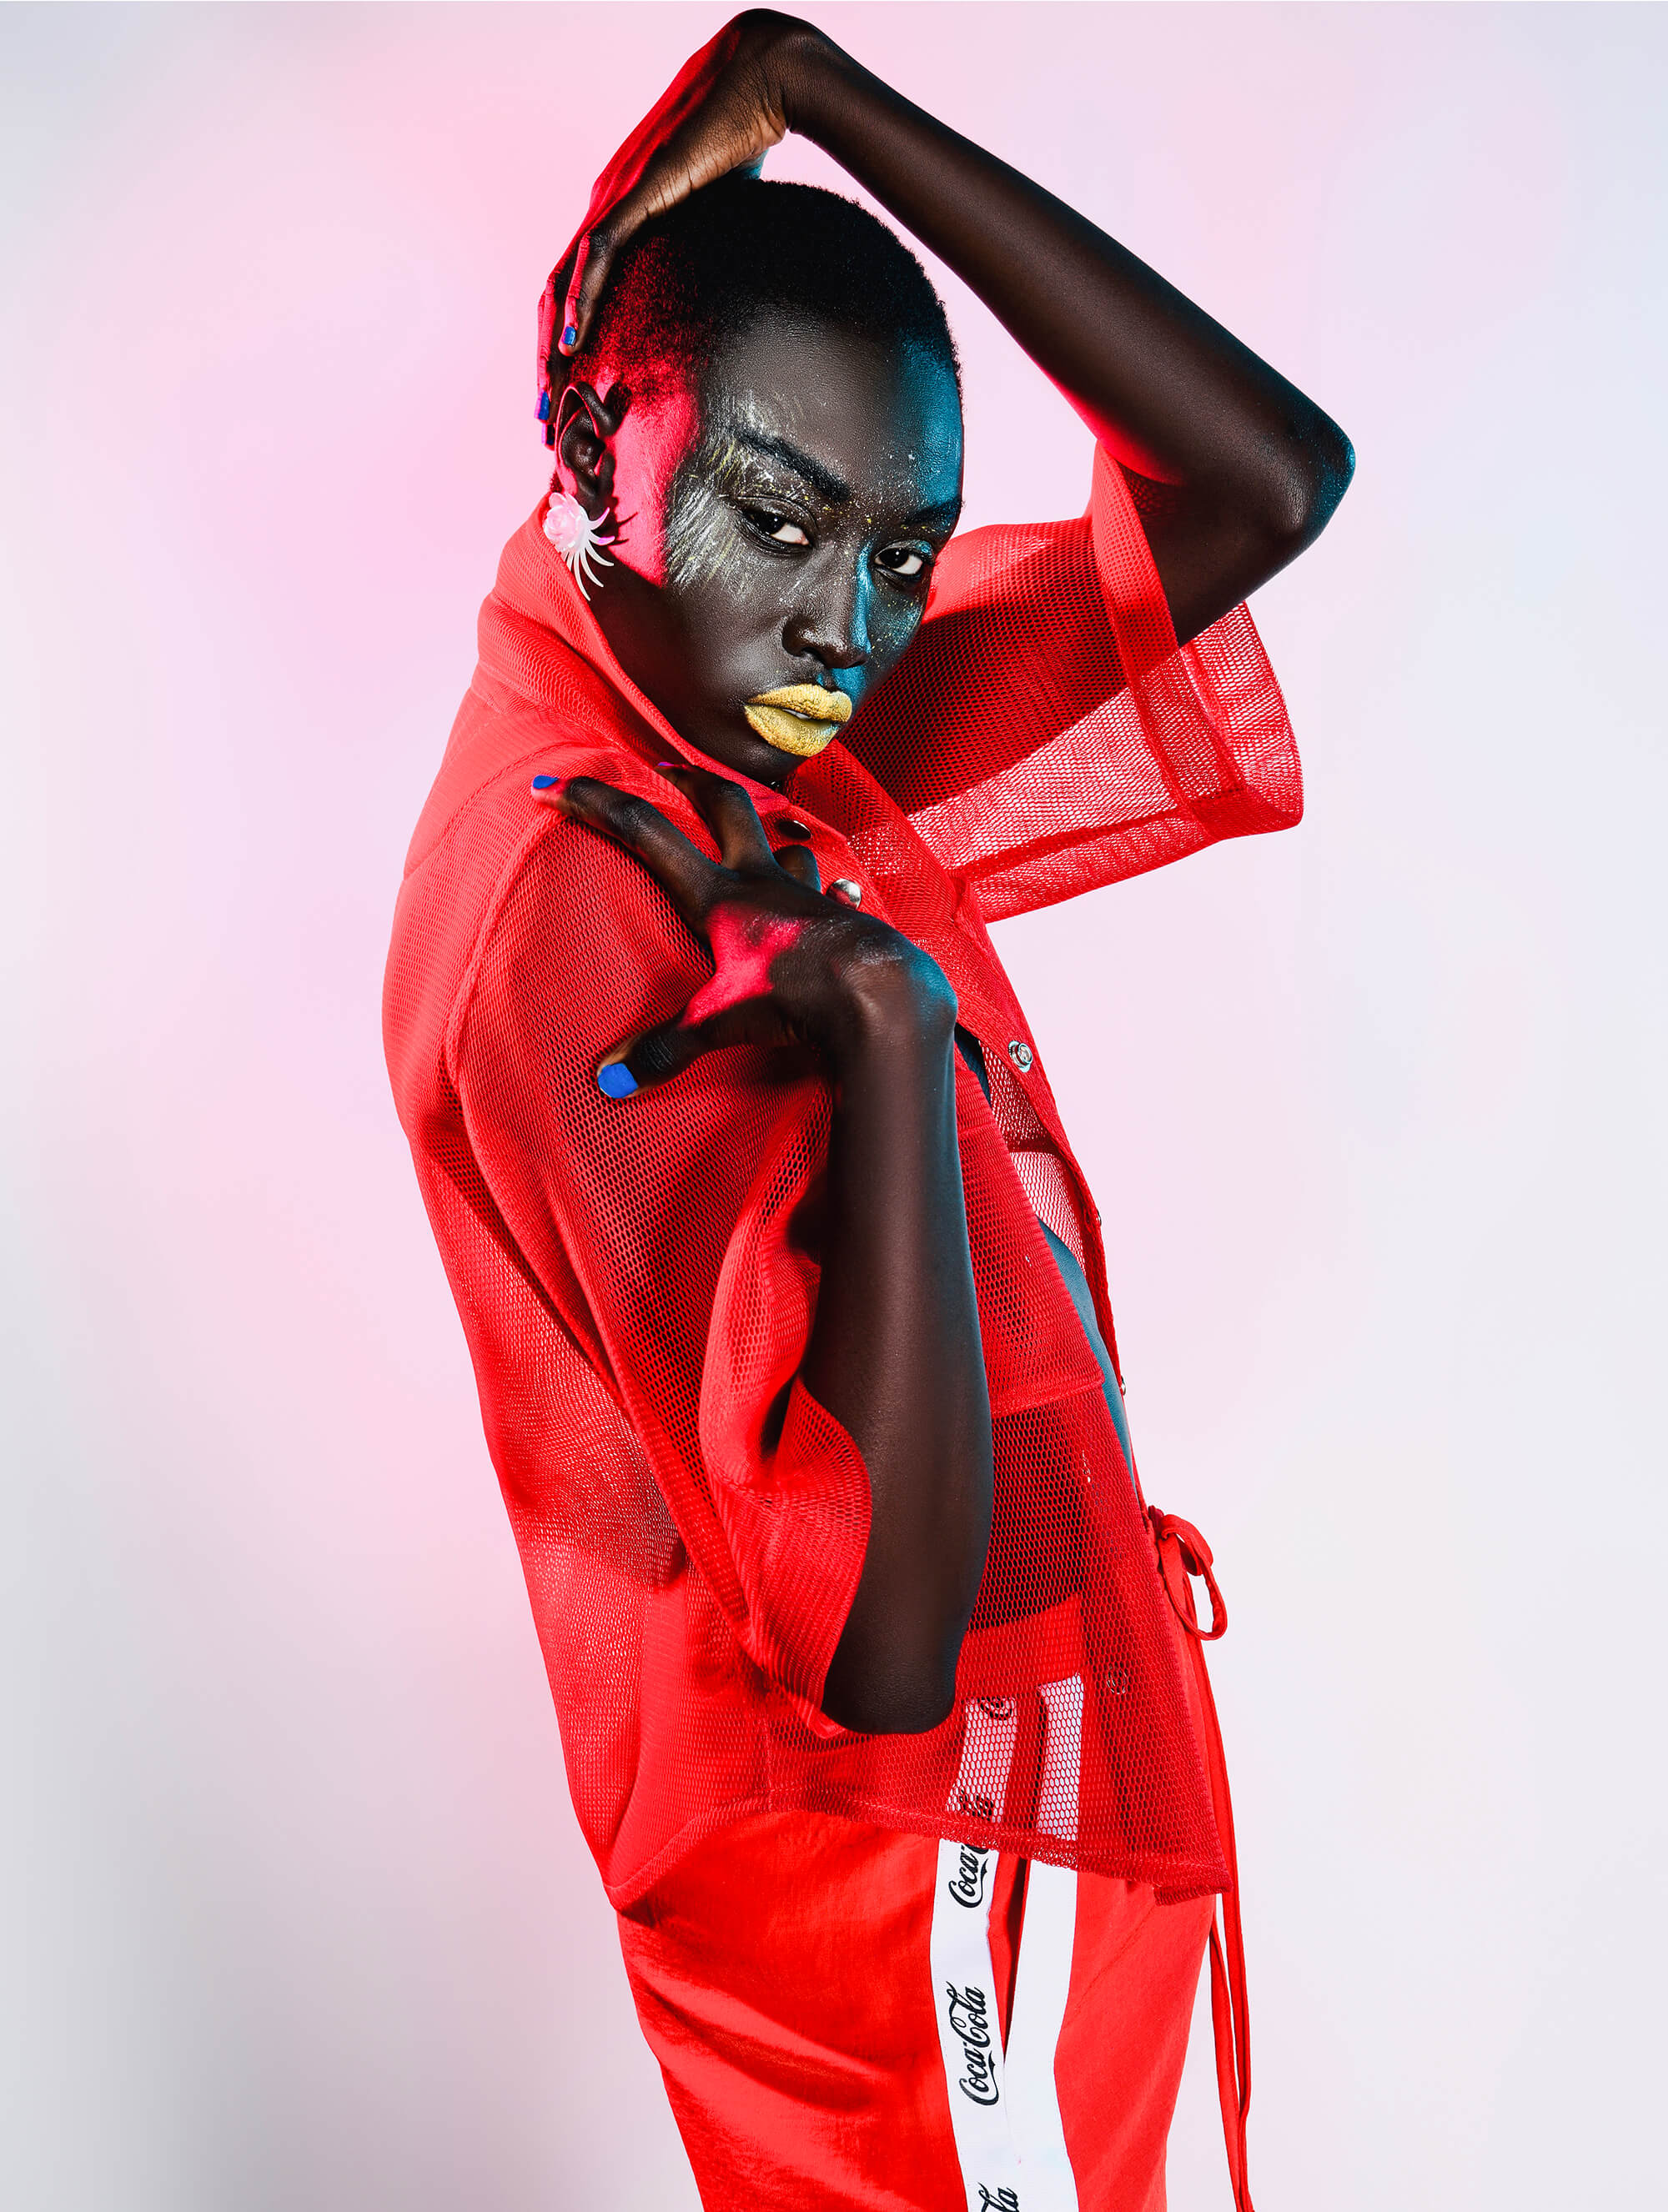 brandon-barnard-photographer-high-fashion-models-johannesburg-south-african-labels-photography-DSC2989.jpg